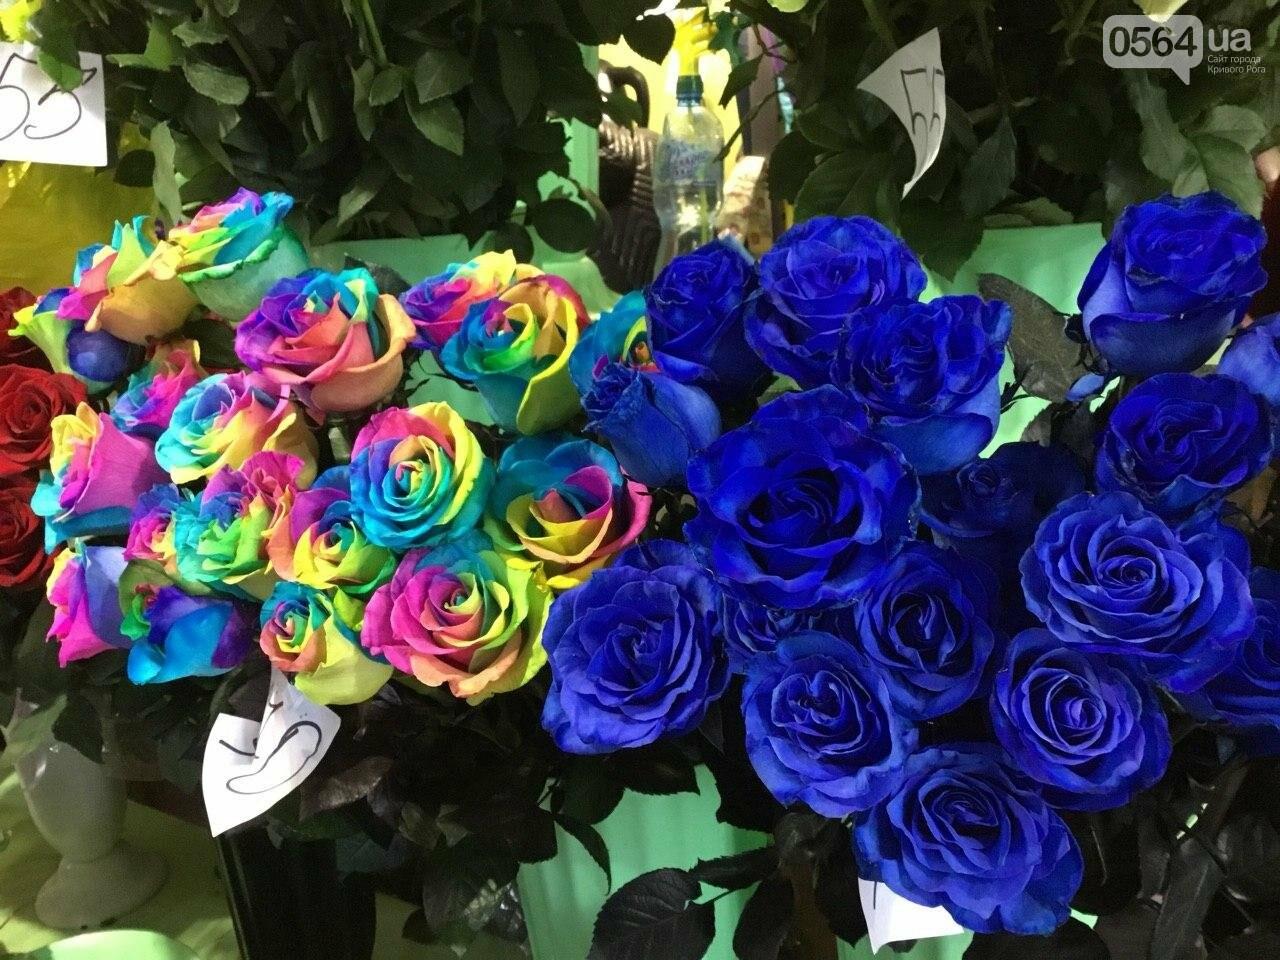 Сколько стоят примула, цикламен, мимоза? Обзор цен на цветы в Кривом Роге, - ФОТО, ВИДЕО, фото-2